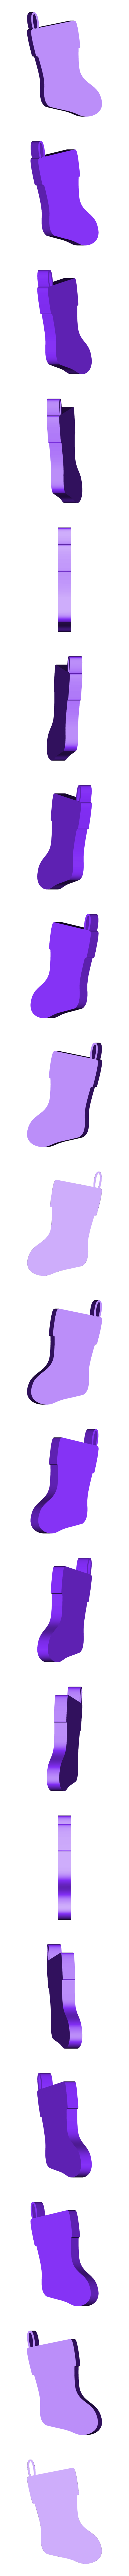 SockOrnament.stl Download free STL file SockOrnament • 3D printer object, Digitang3D